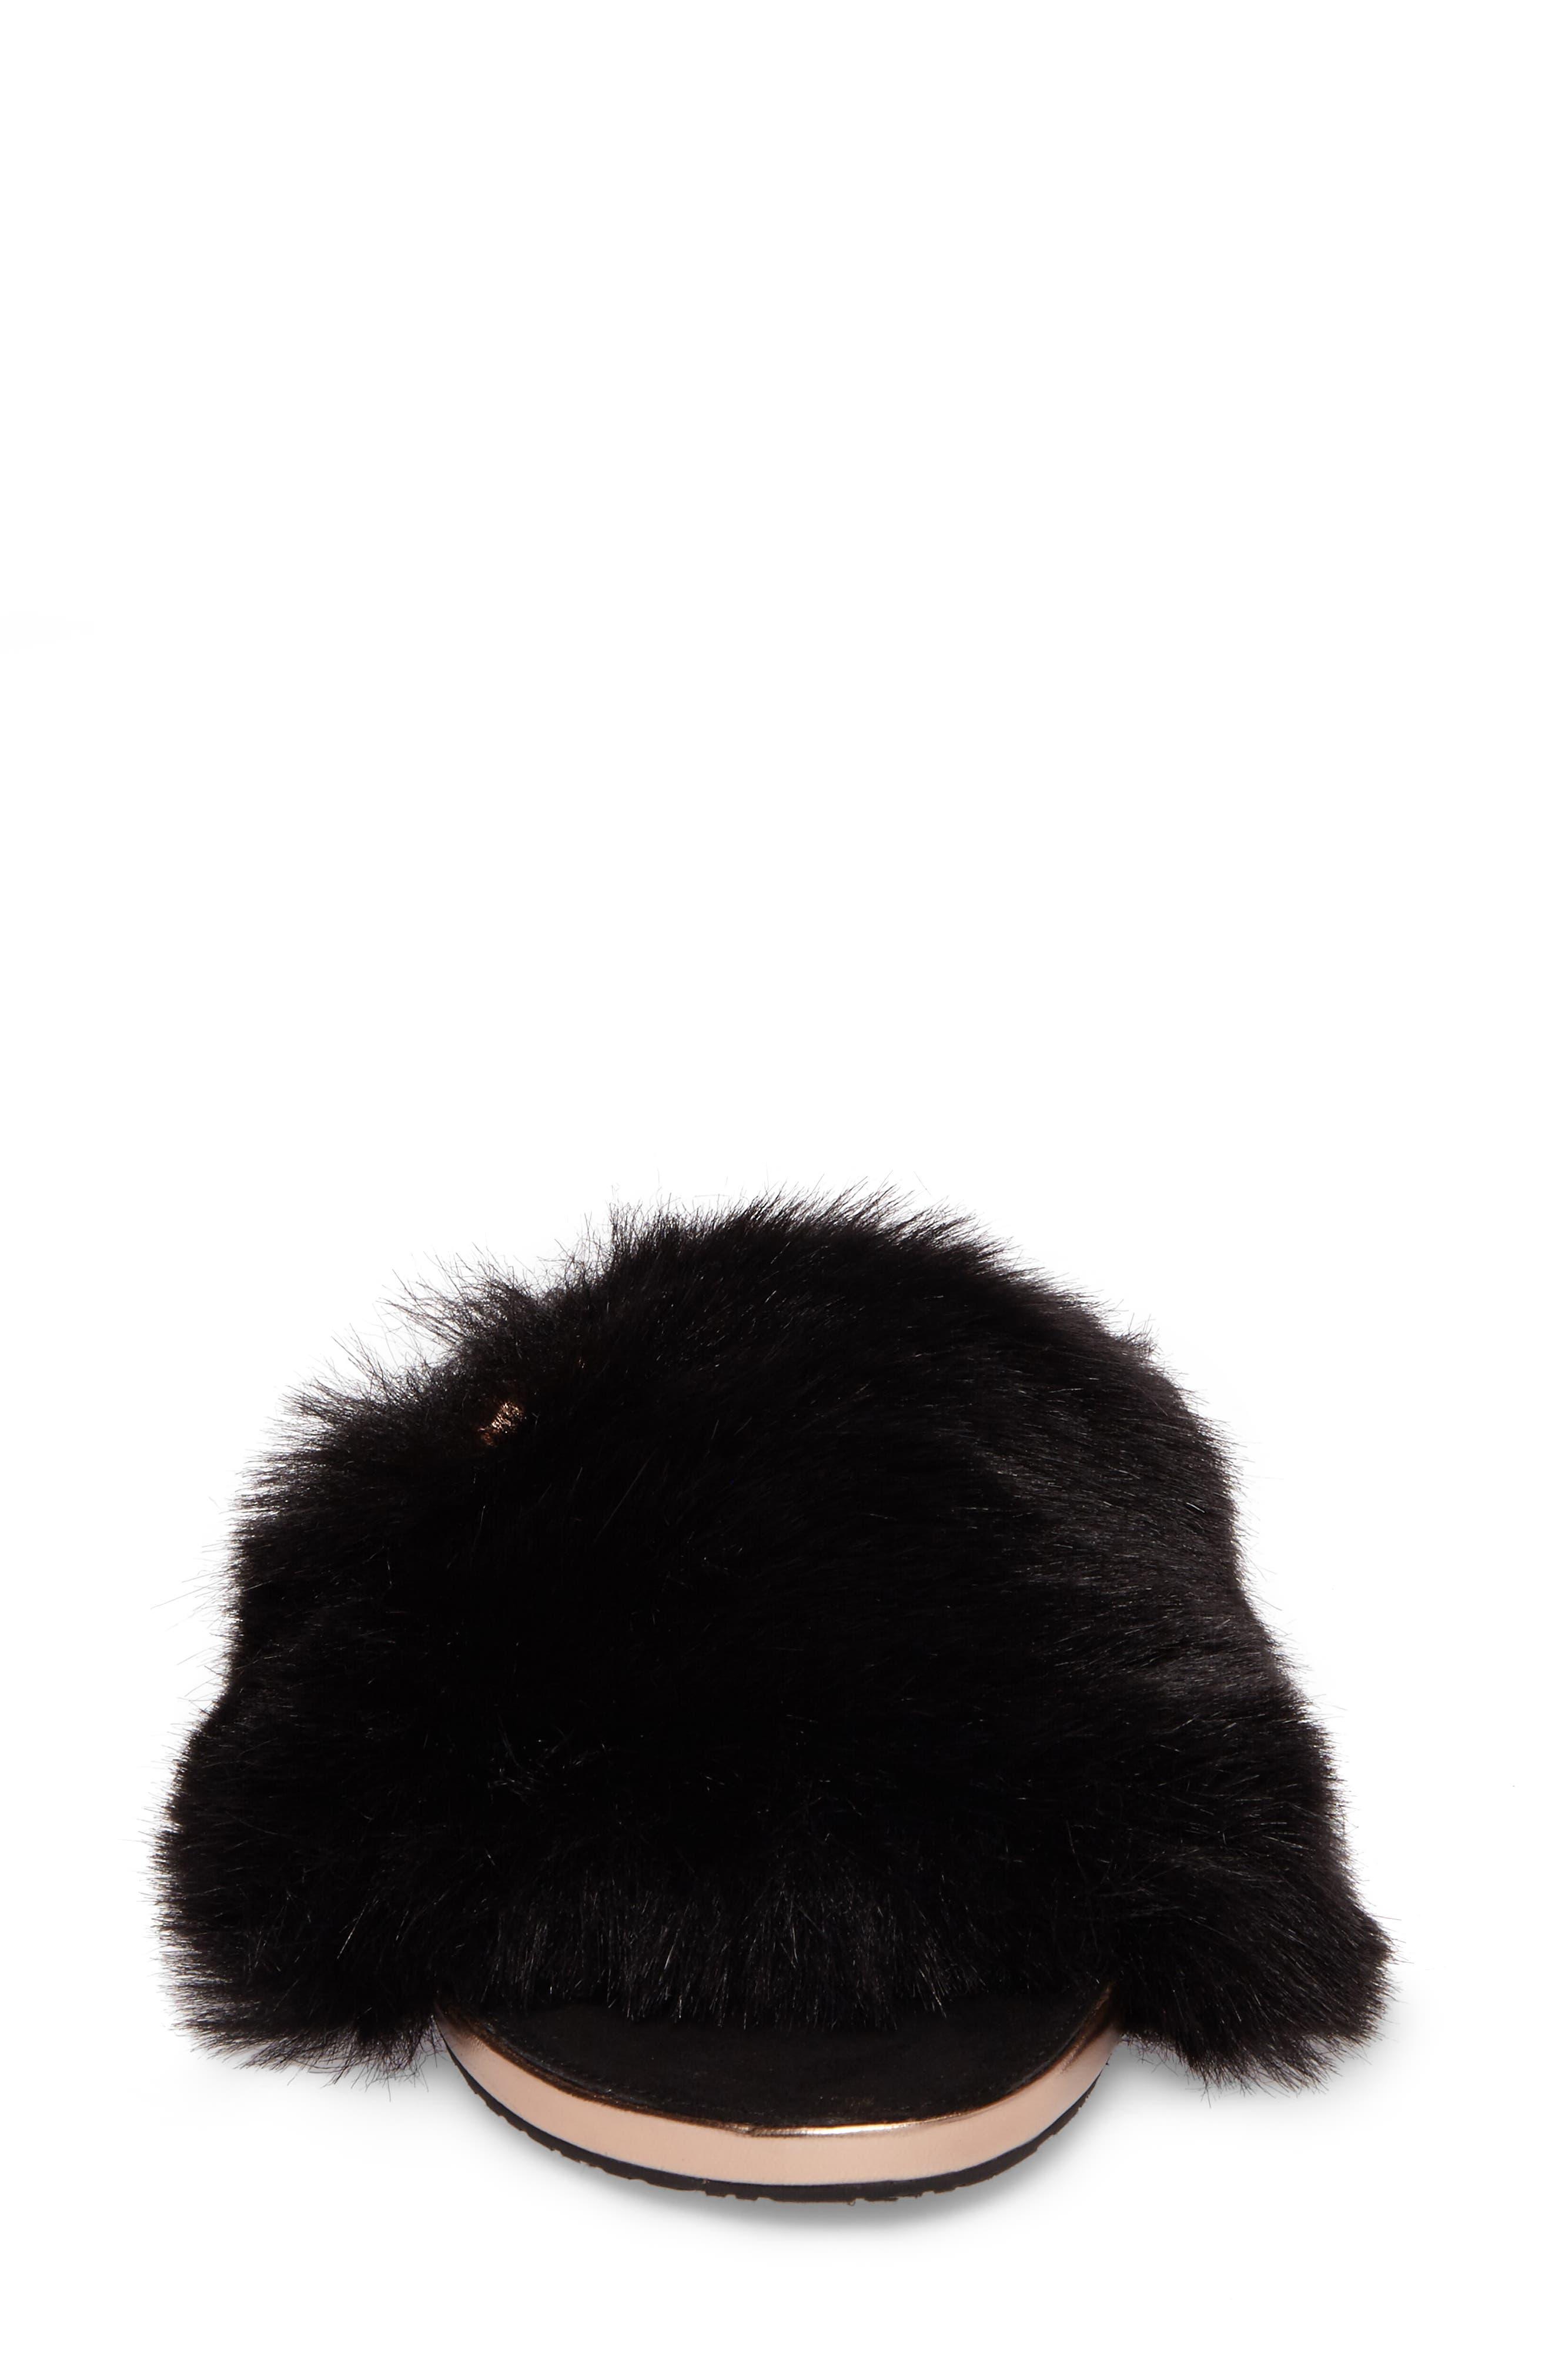 Pancey Faux Fur Slipper,                             Alternate thumbnail 4, color,                             001